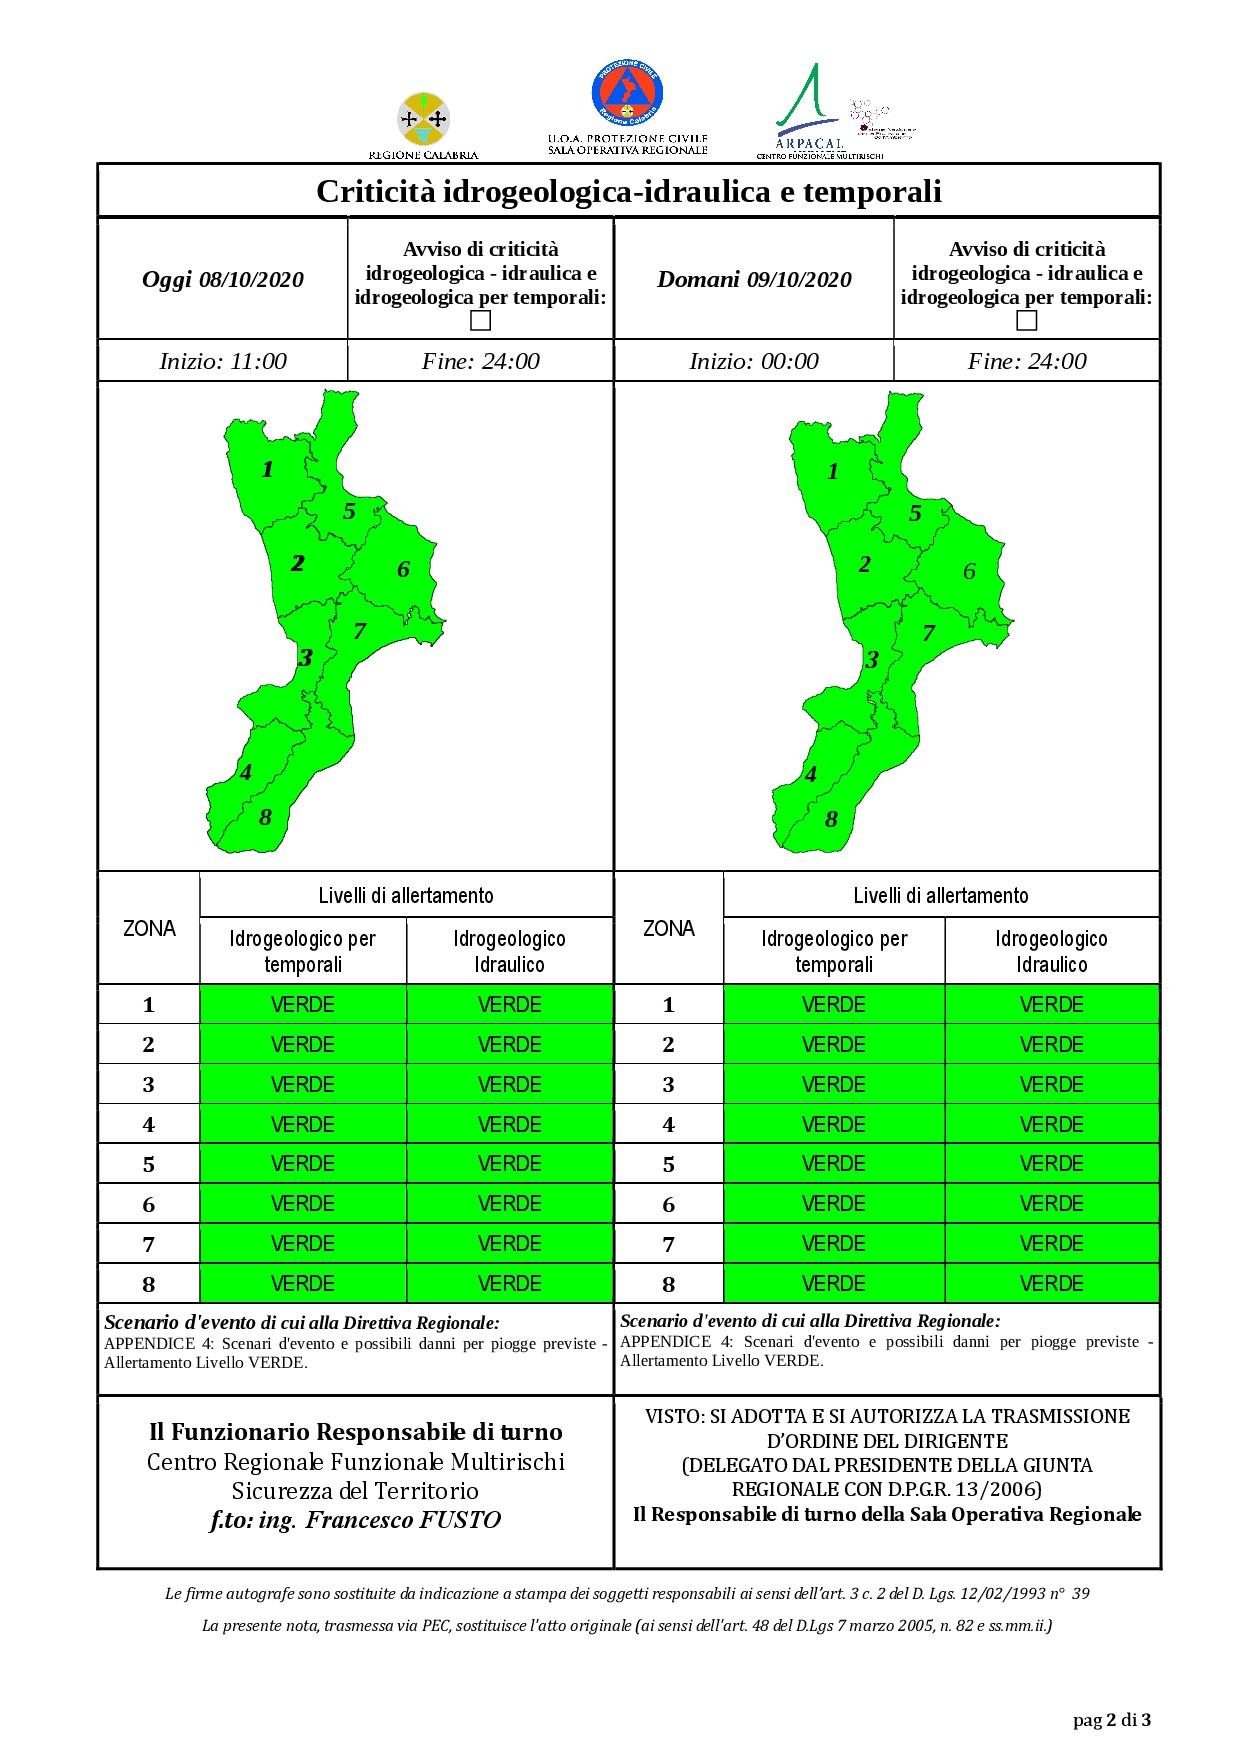 Criticità idrogeologica-idraulica e temporali in Calabria 08-10-2020